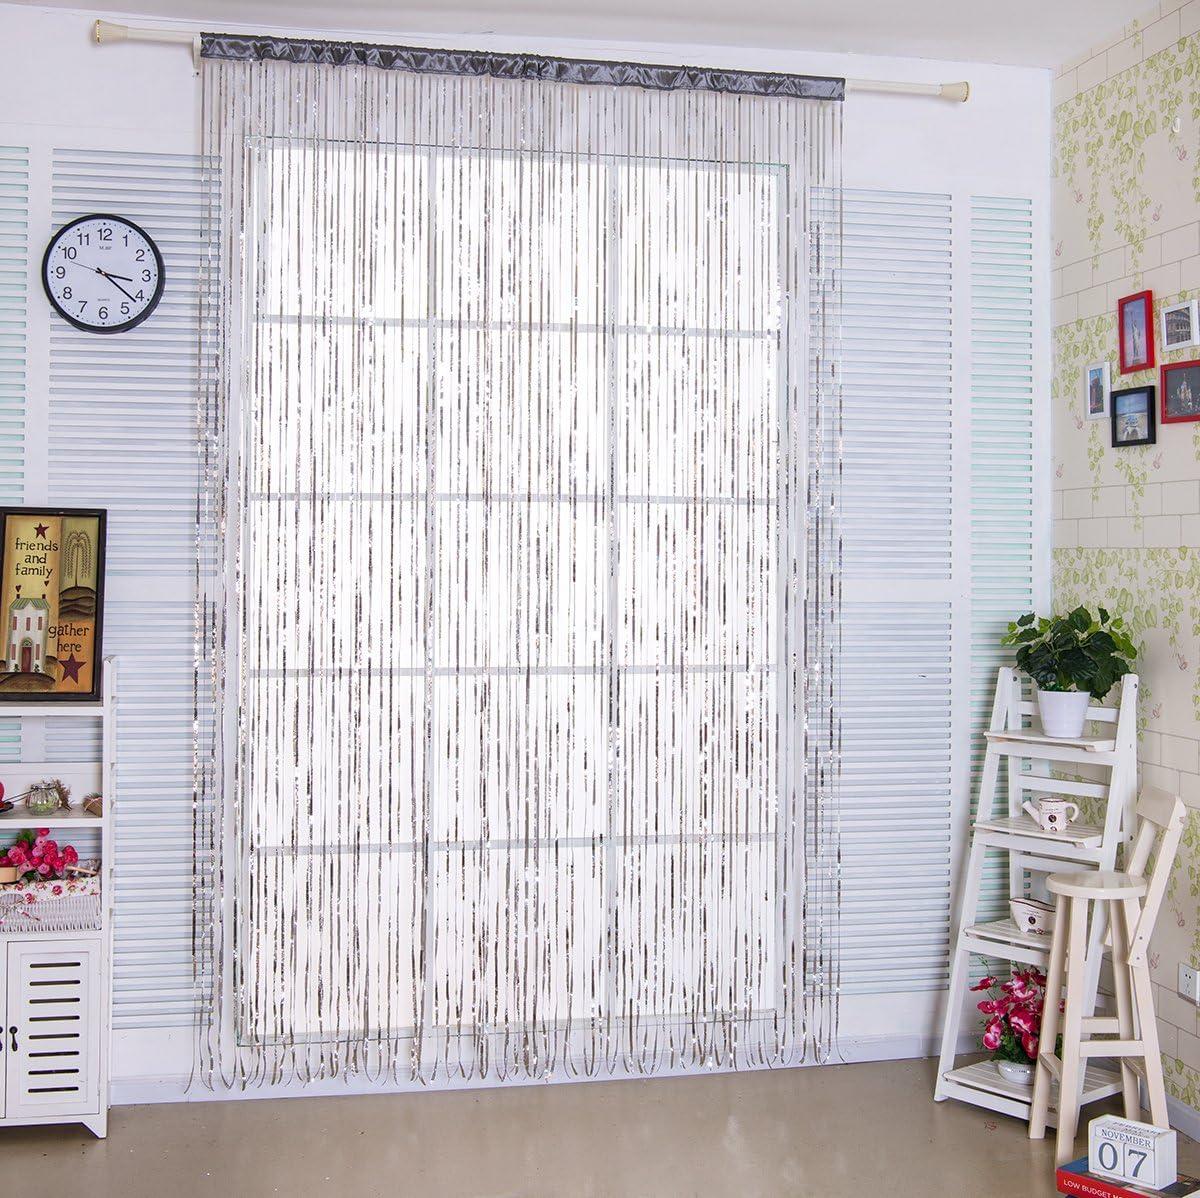 hsylym lentejuelas cortina de puerta de panel separador de pared para eventos decoración: Amazon.es: Hogar